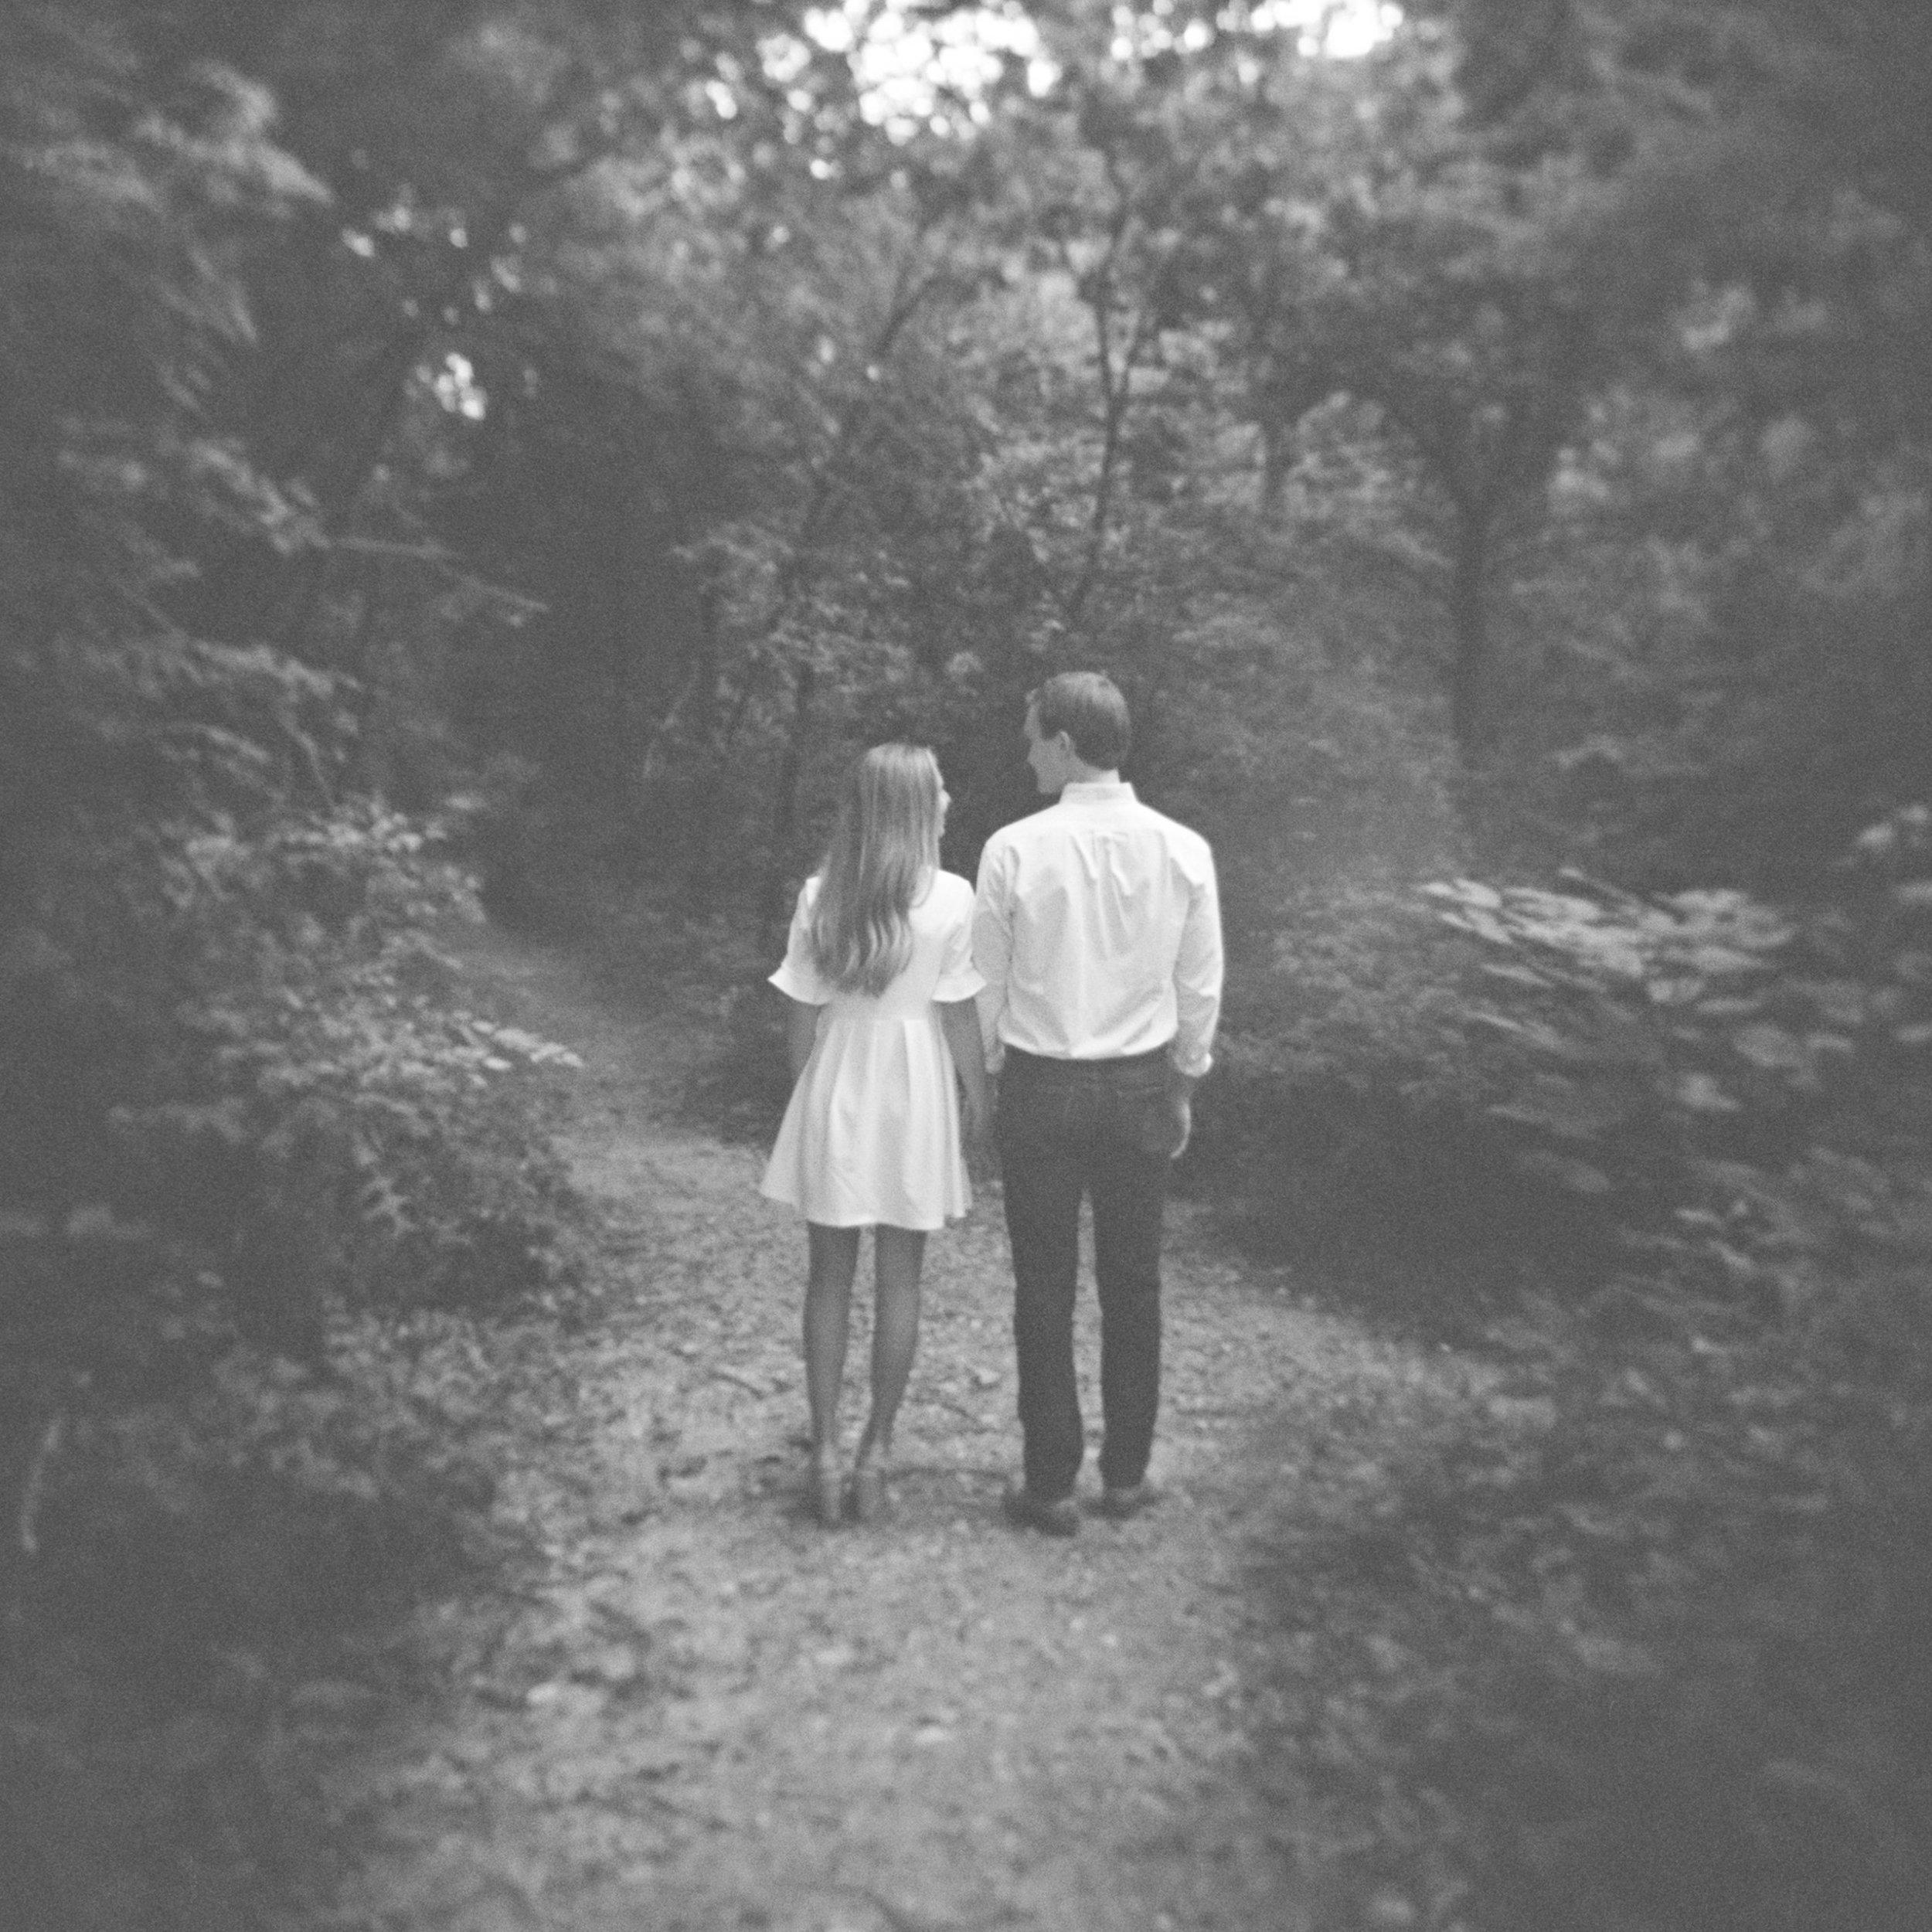 Olivia_Patrick_Engagement_Abigail_Malone_Photography-152.jpg